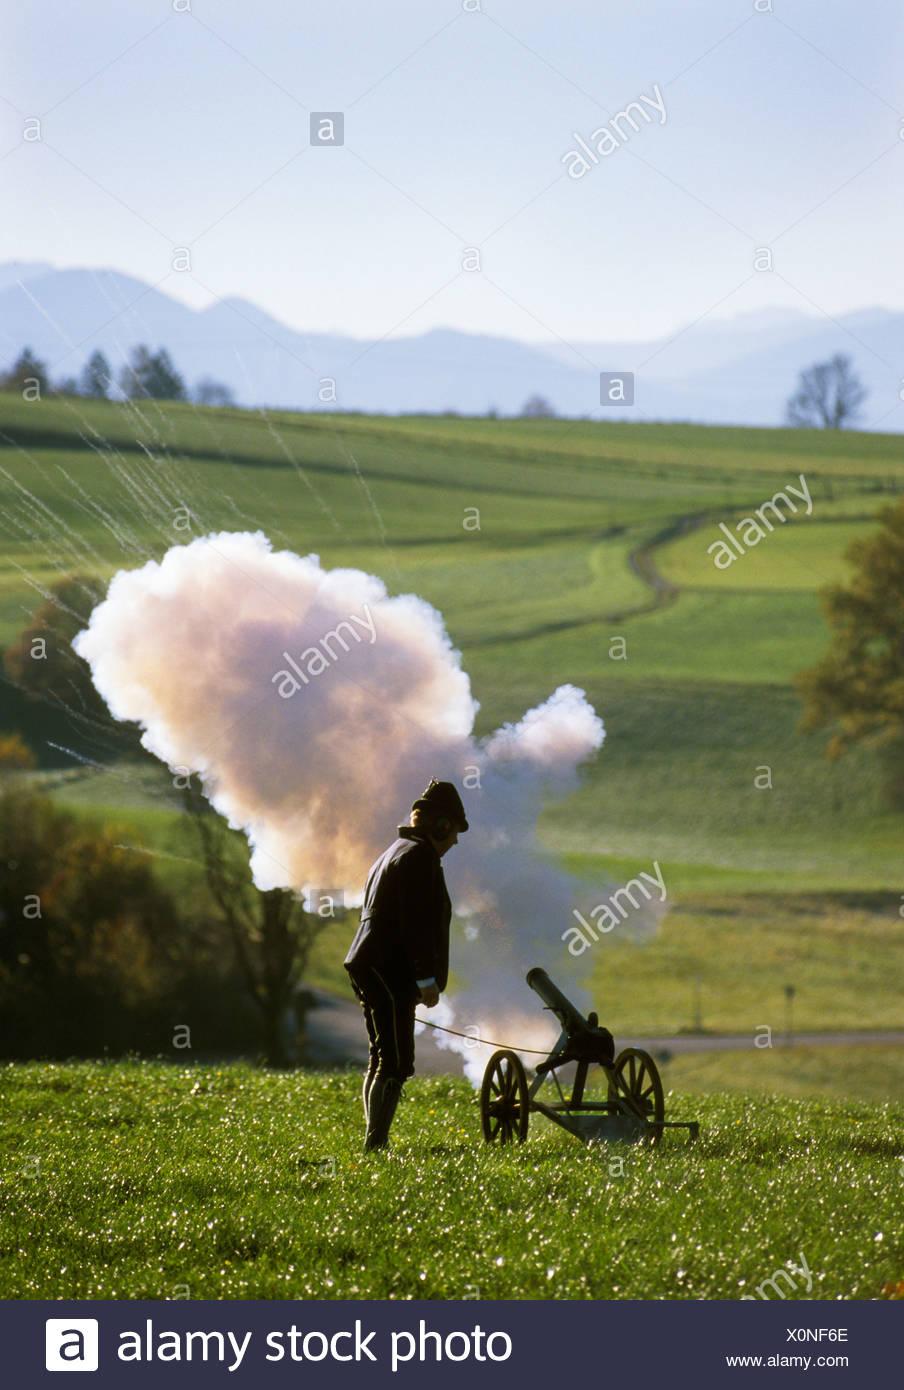 Greimharting Chiemgau Upper Bavaria Germany shooter firering a saluting gun - Stock Image